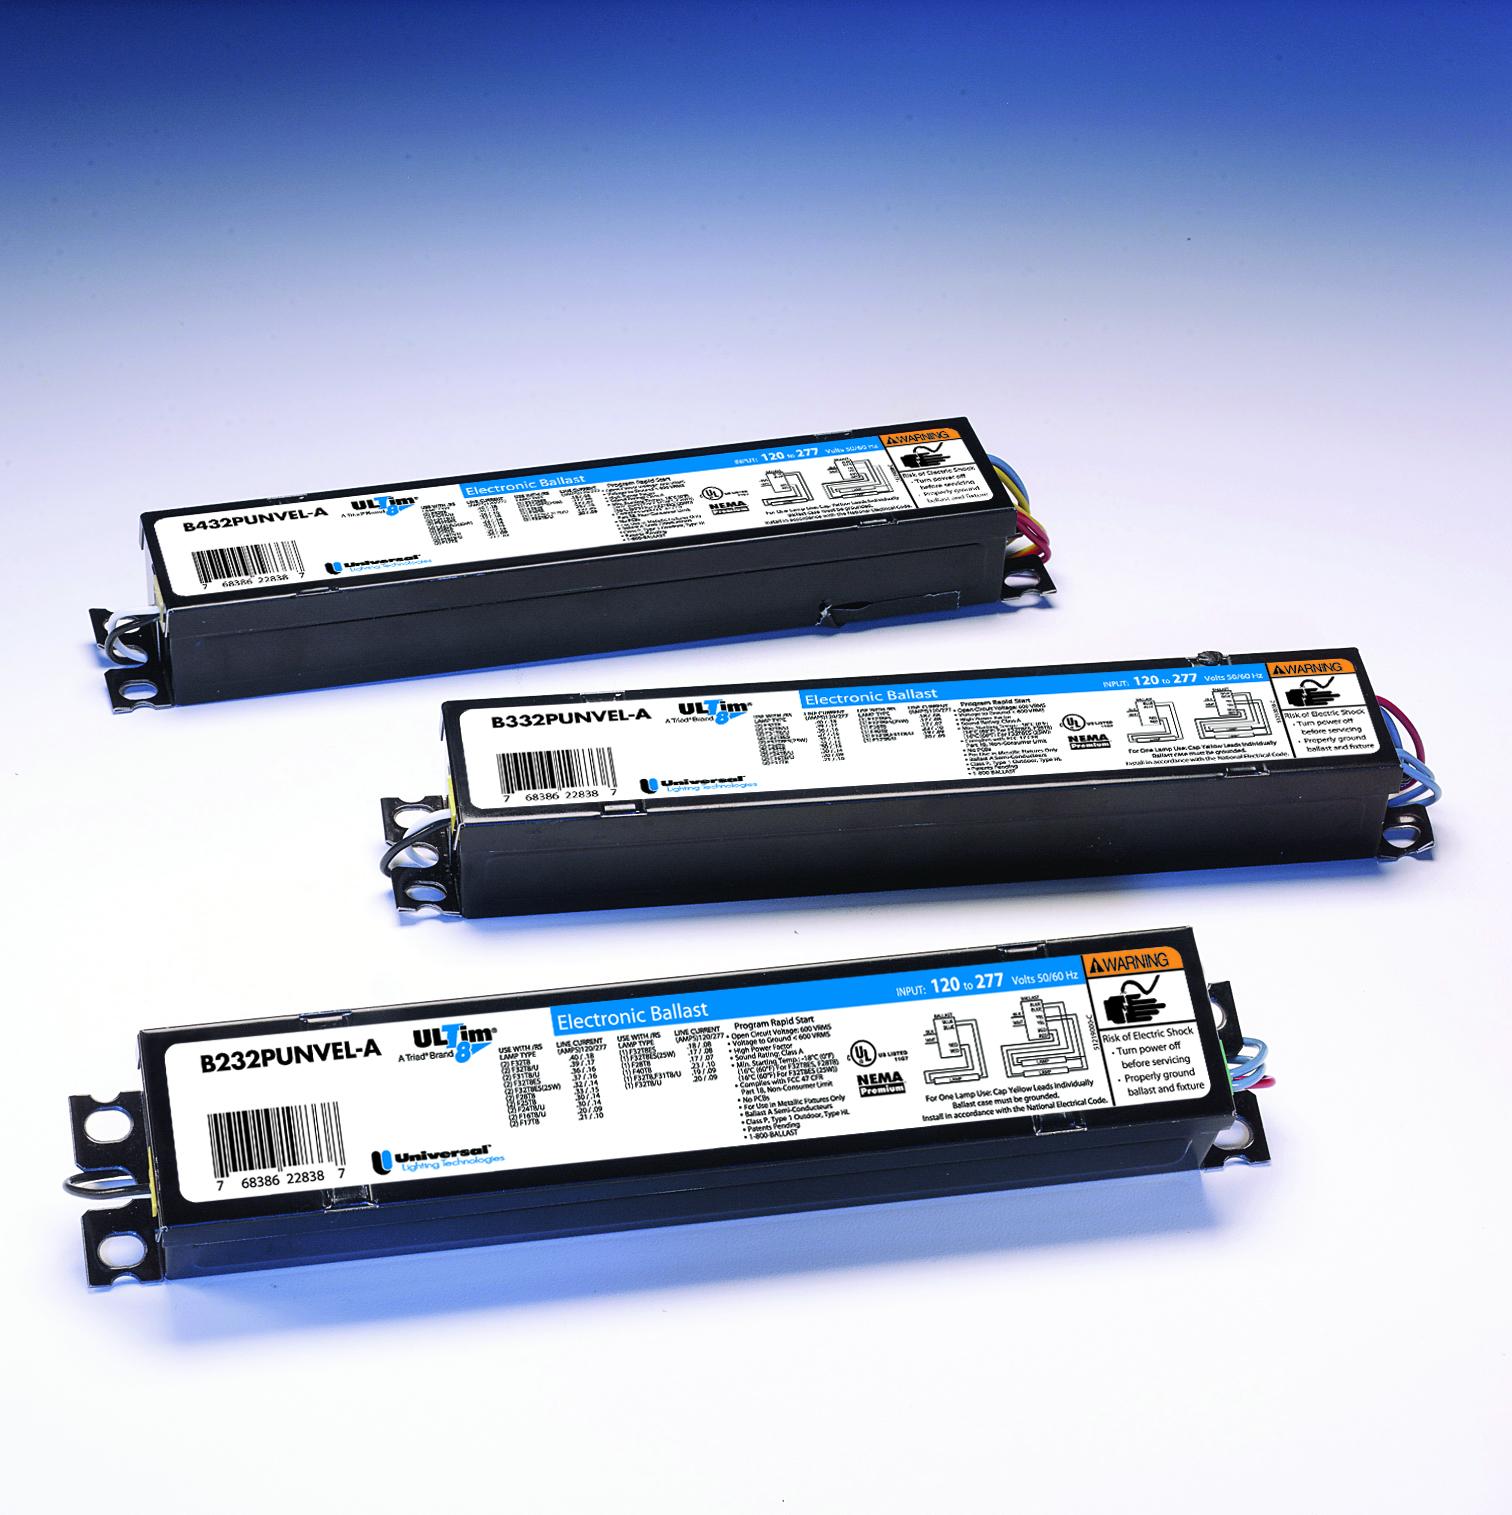 Universal Lighting Technologies B259IUNVHP-A000C UNIVERSAL LIGHTING TECH B259IUNVHPA000C